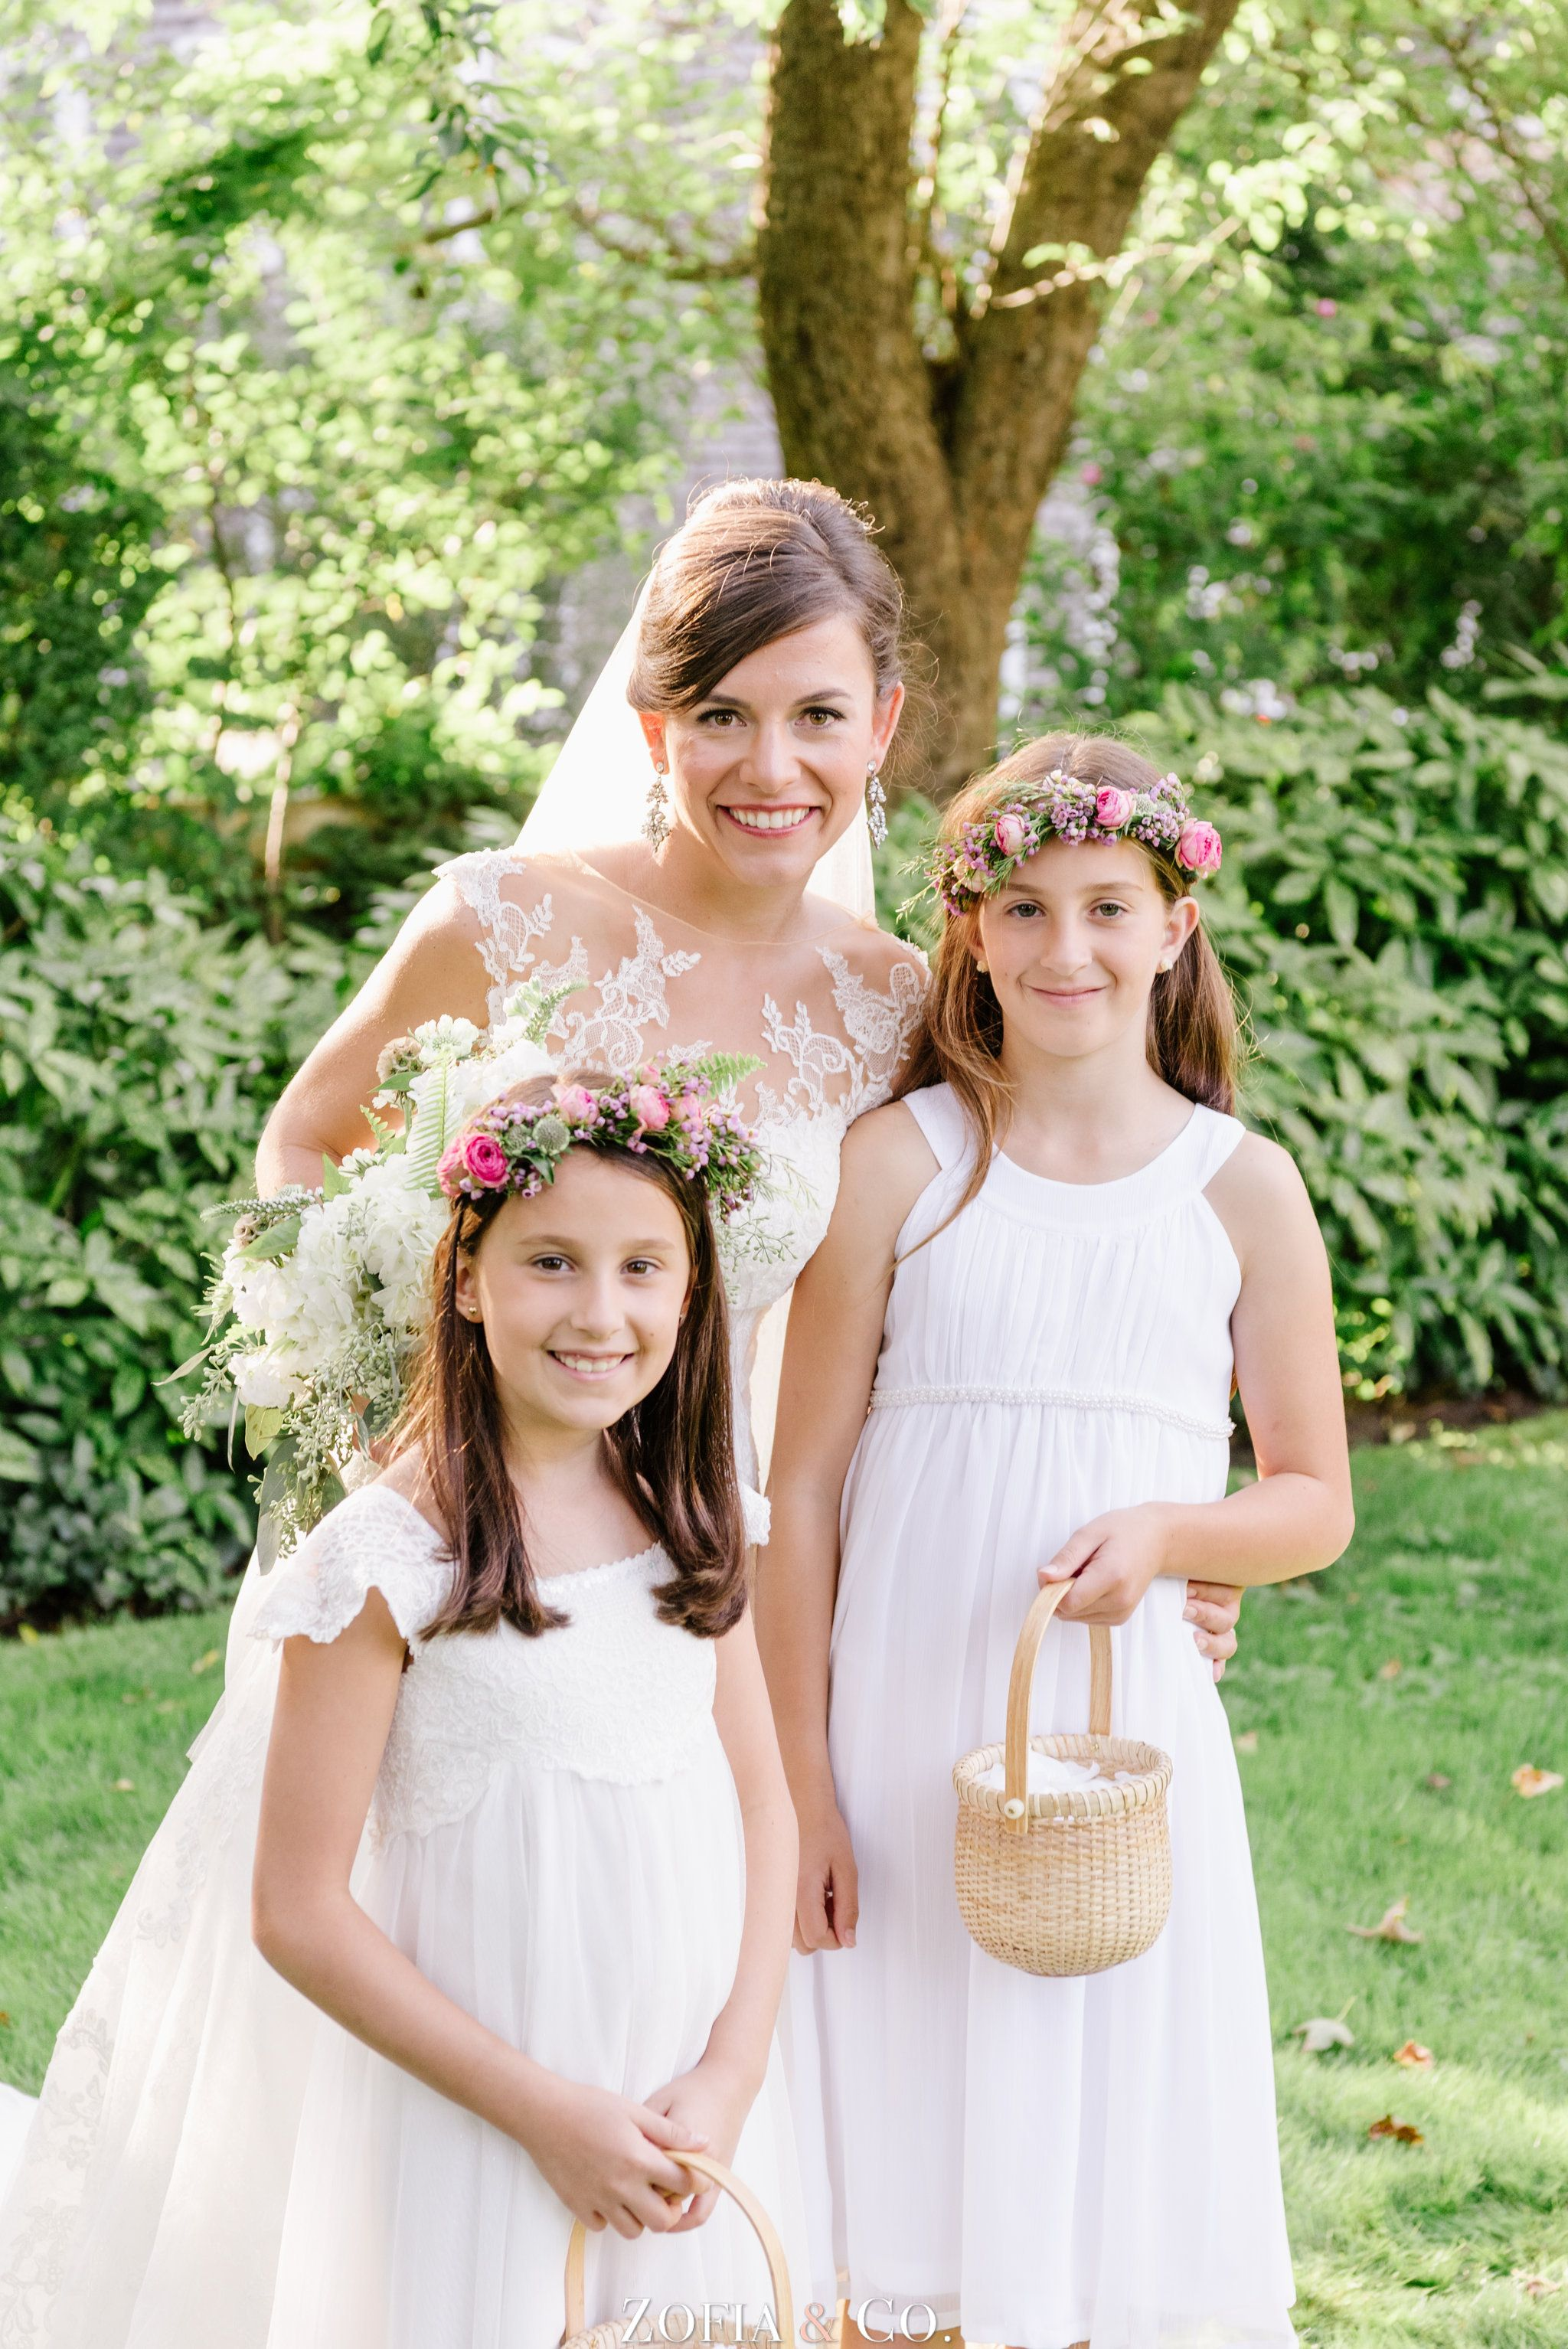 Nantucket wedding flower girl crowns and baskets soiree floral nantucket wedding flower girl crowns and baskets soiree floral zofia co izmirmasajfo